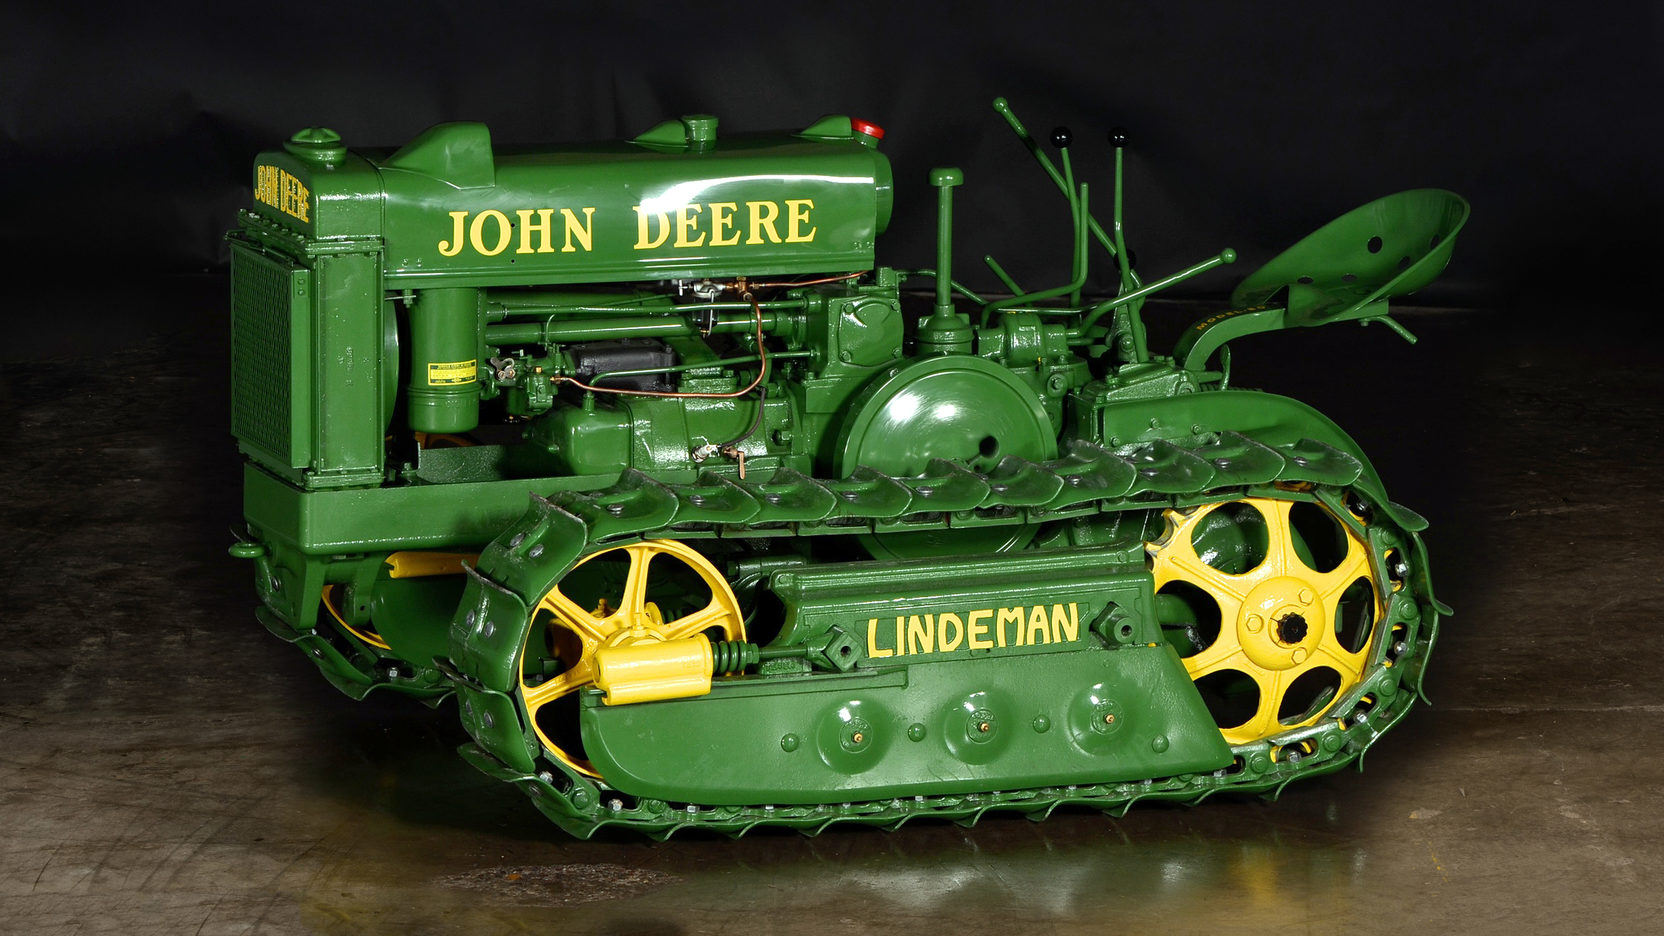 John Deere Bo Lindeman Crawler | F55 | Muscatine 2017